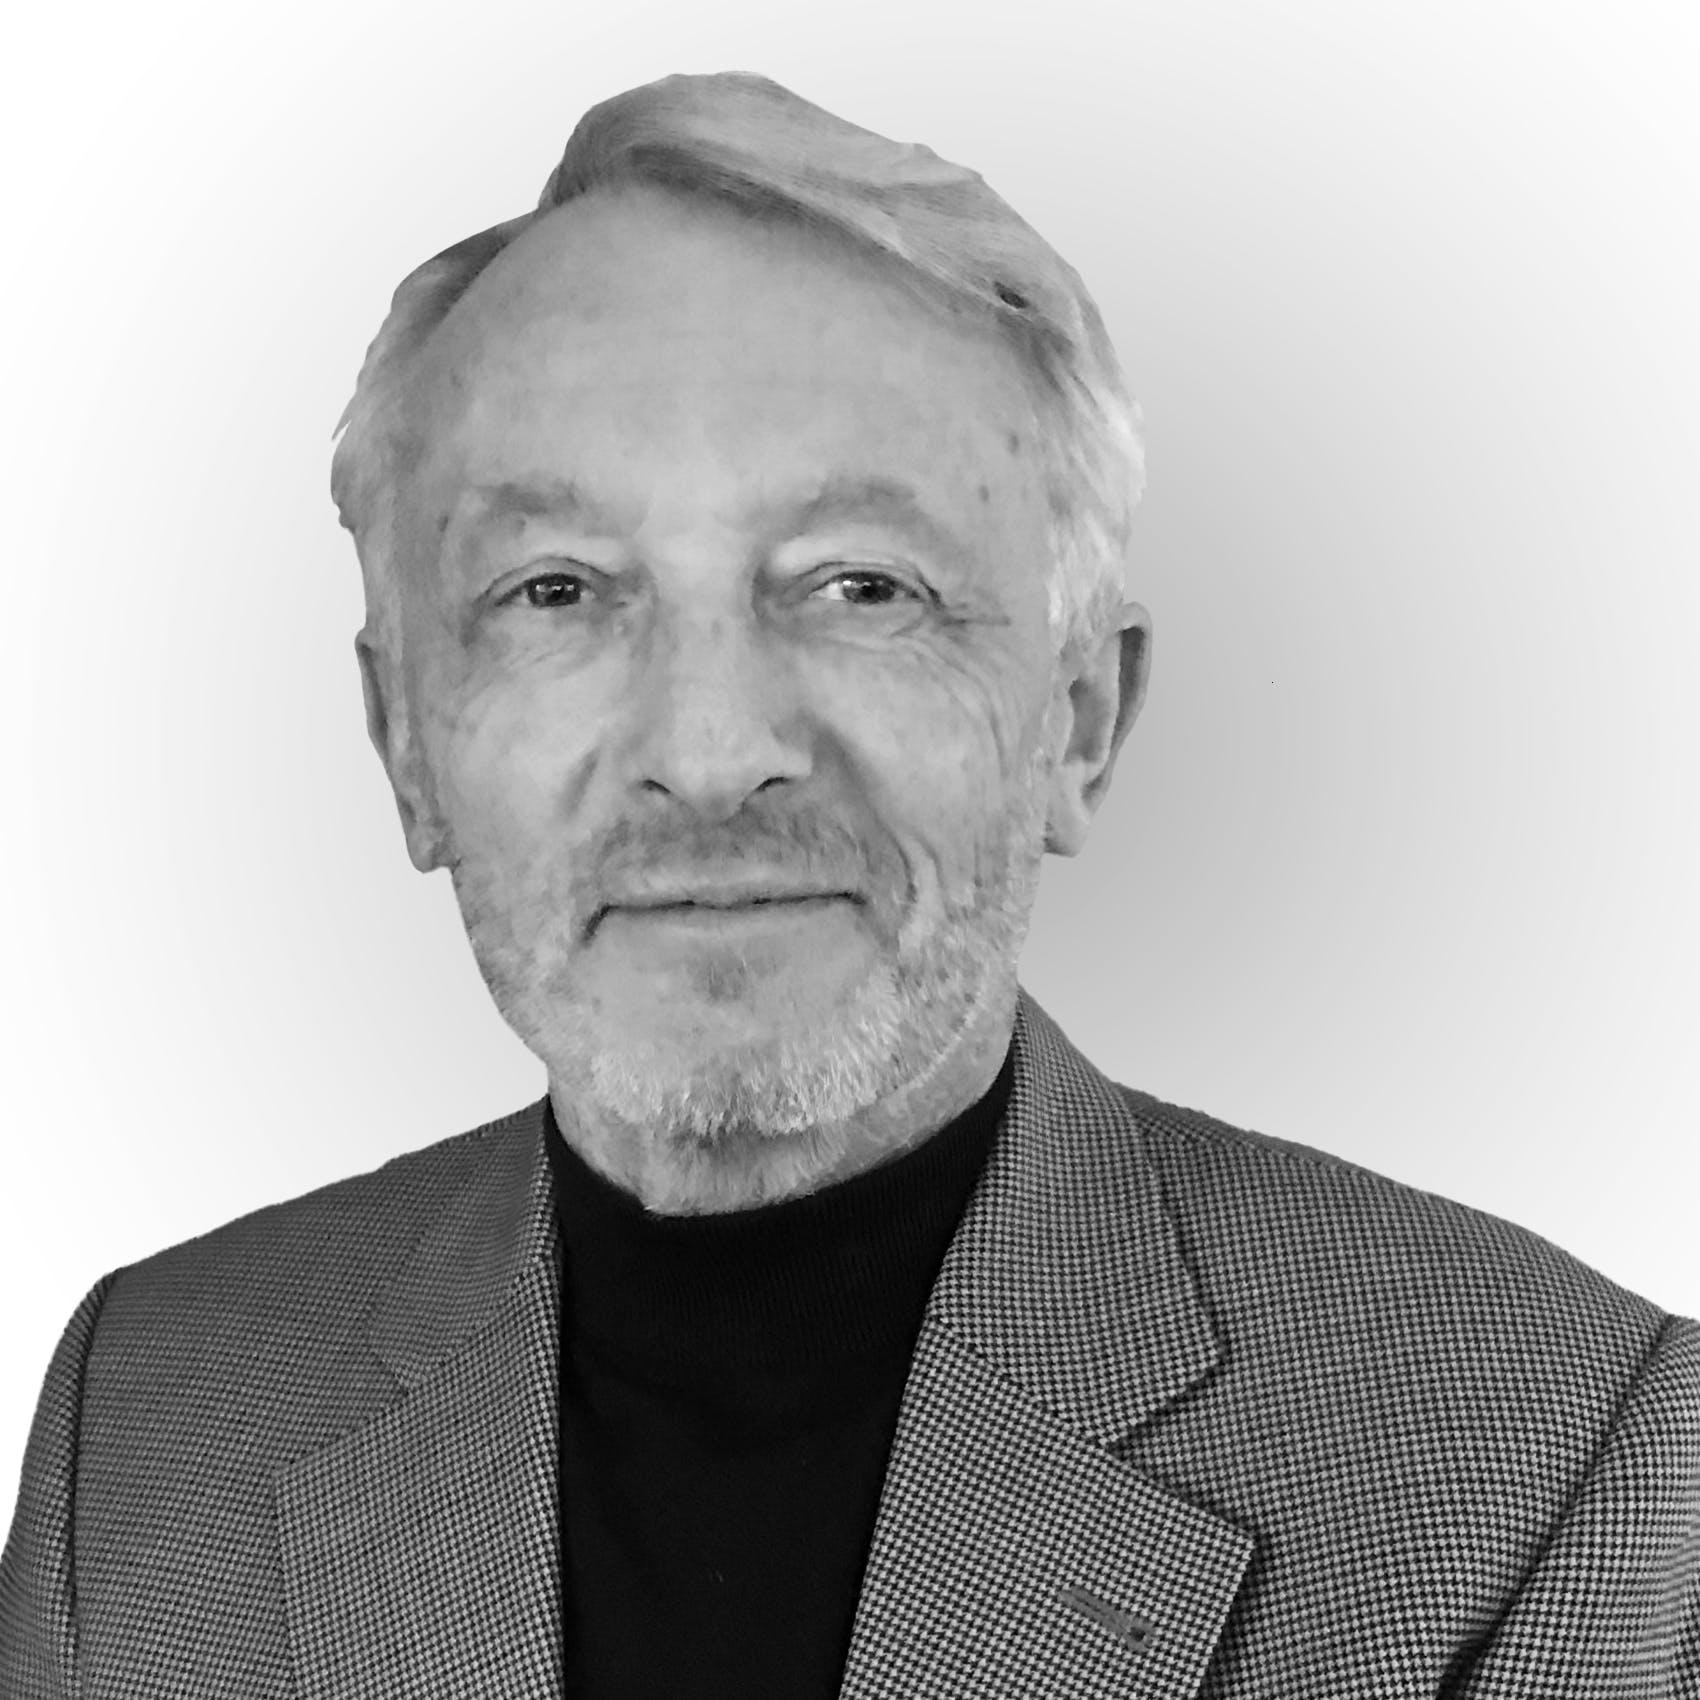 Photo Frédéric ROUSSET